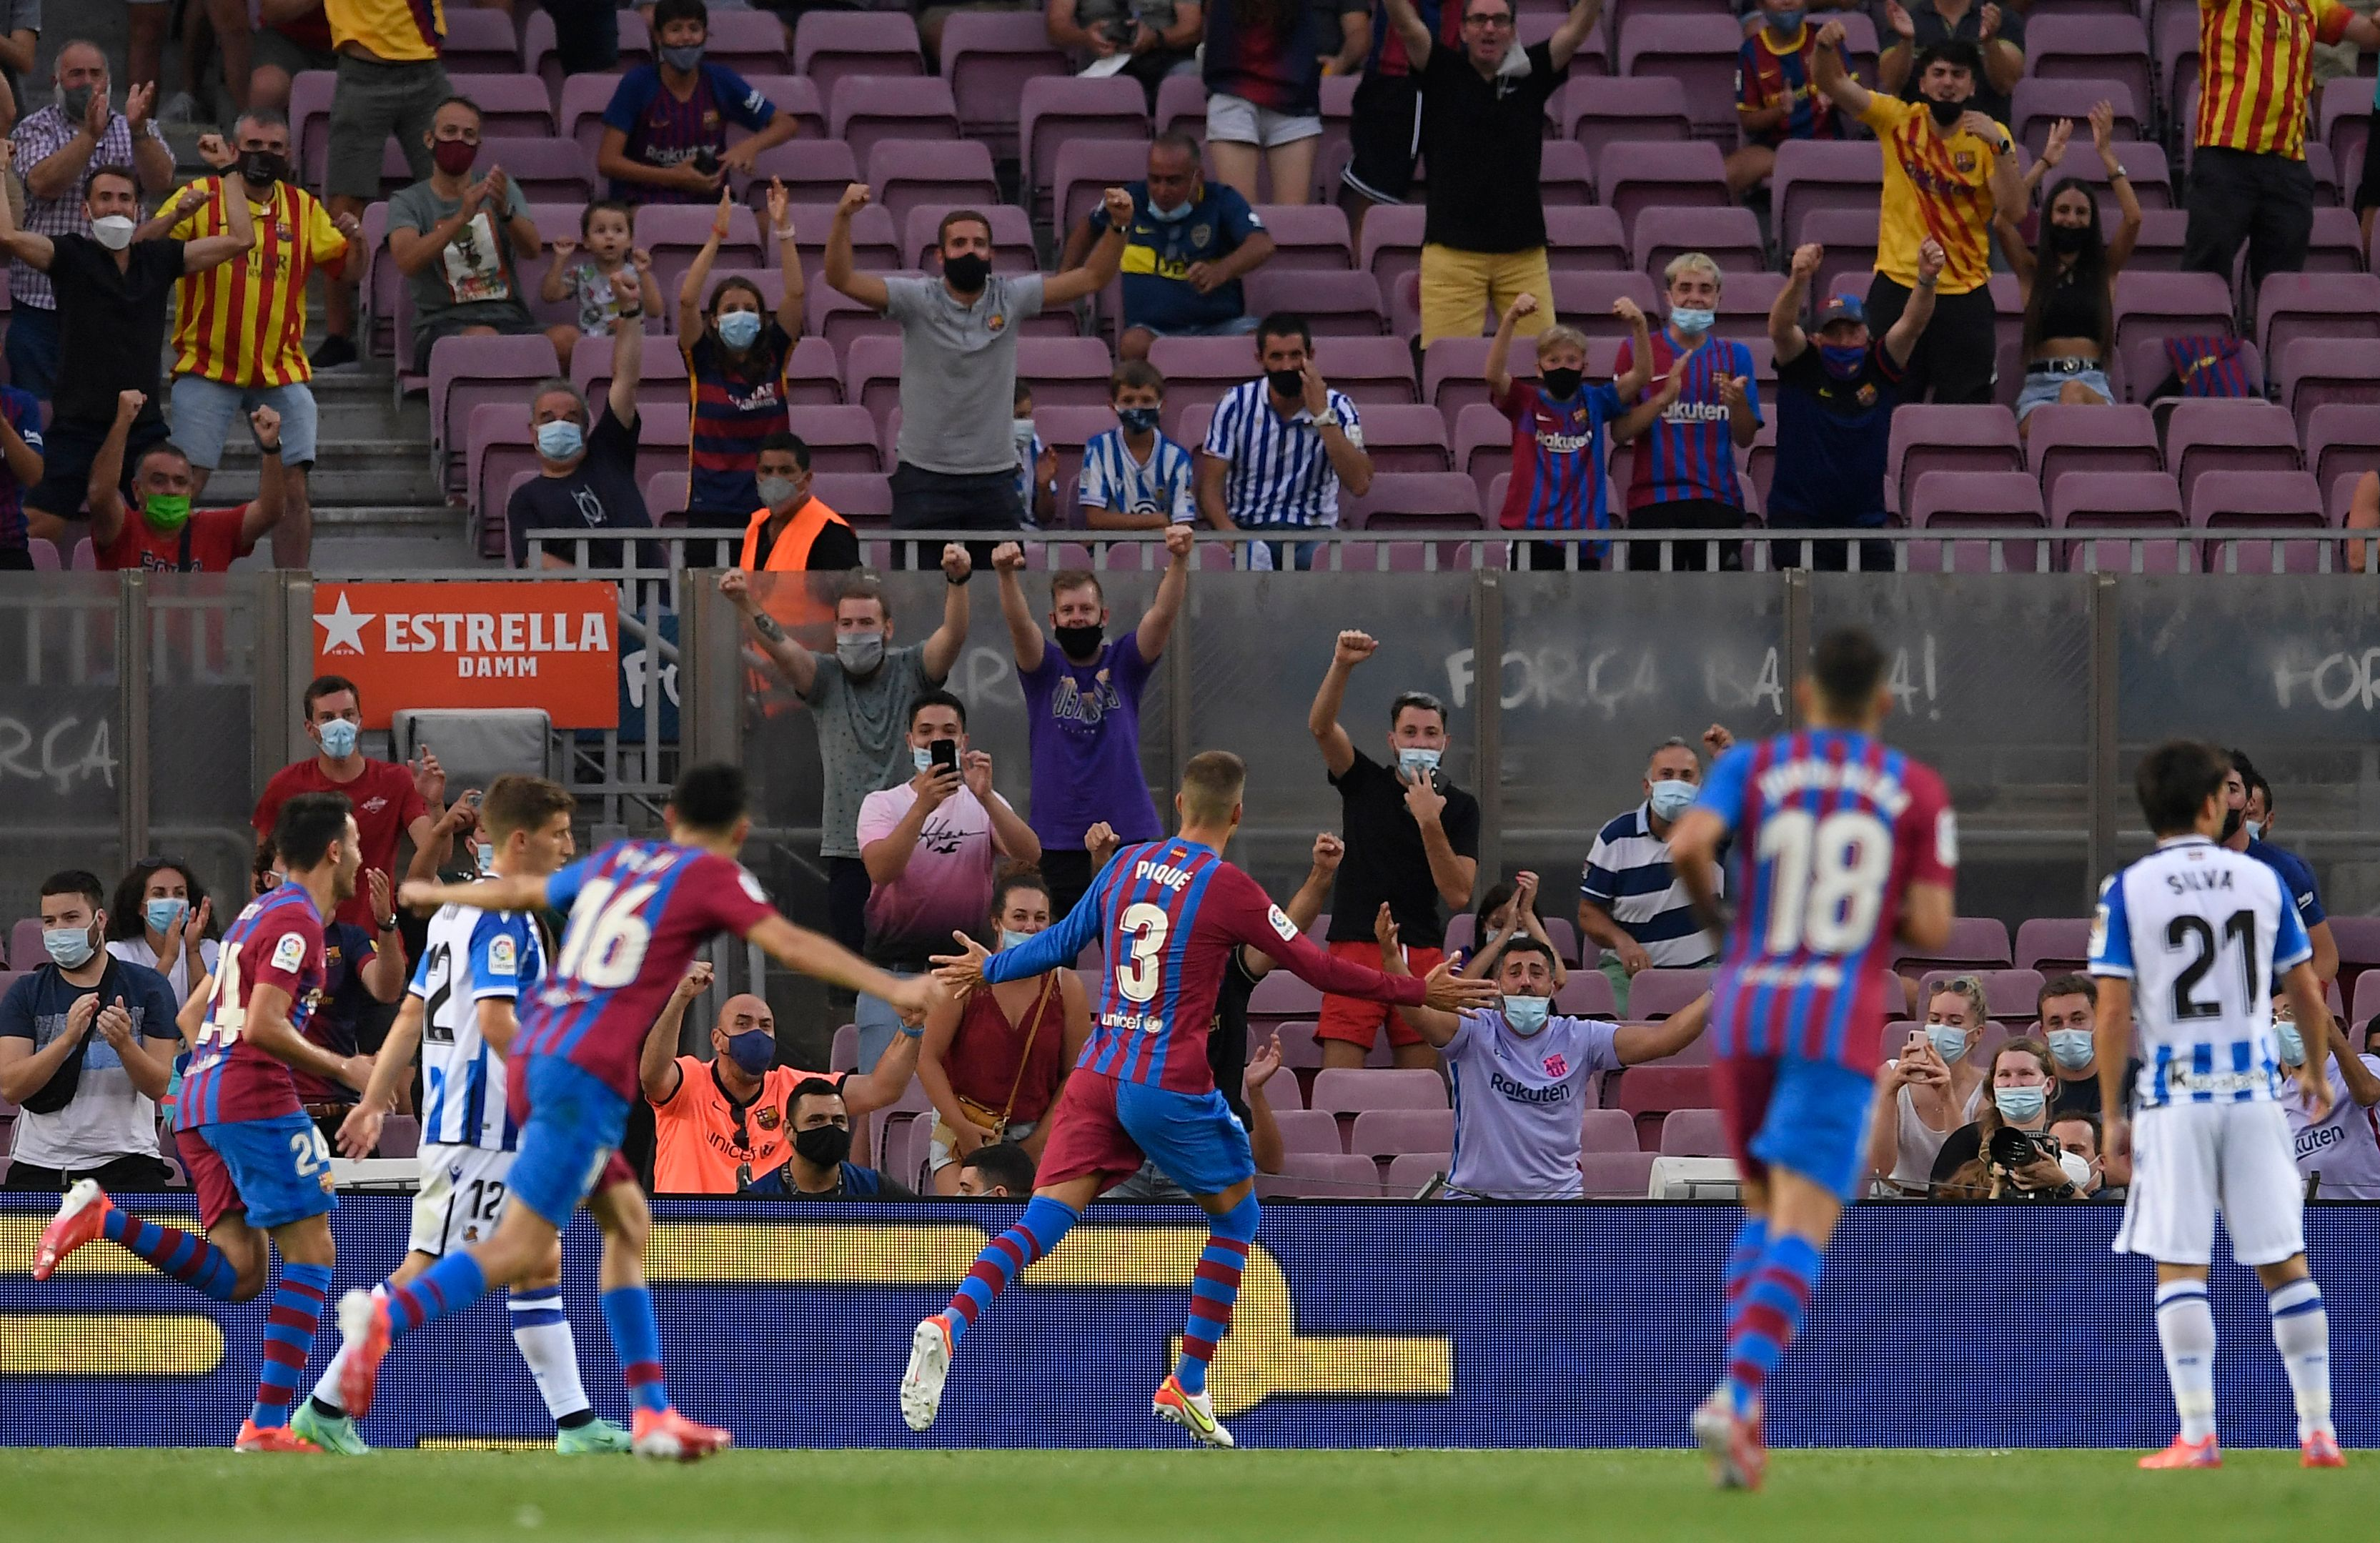 Big celebrates with Barcelona fans